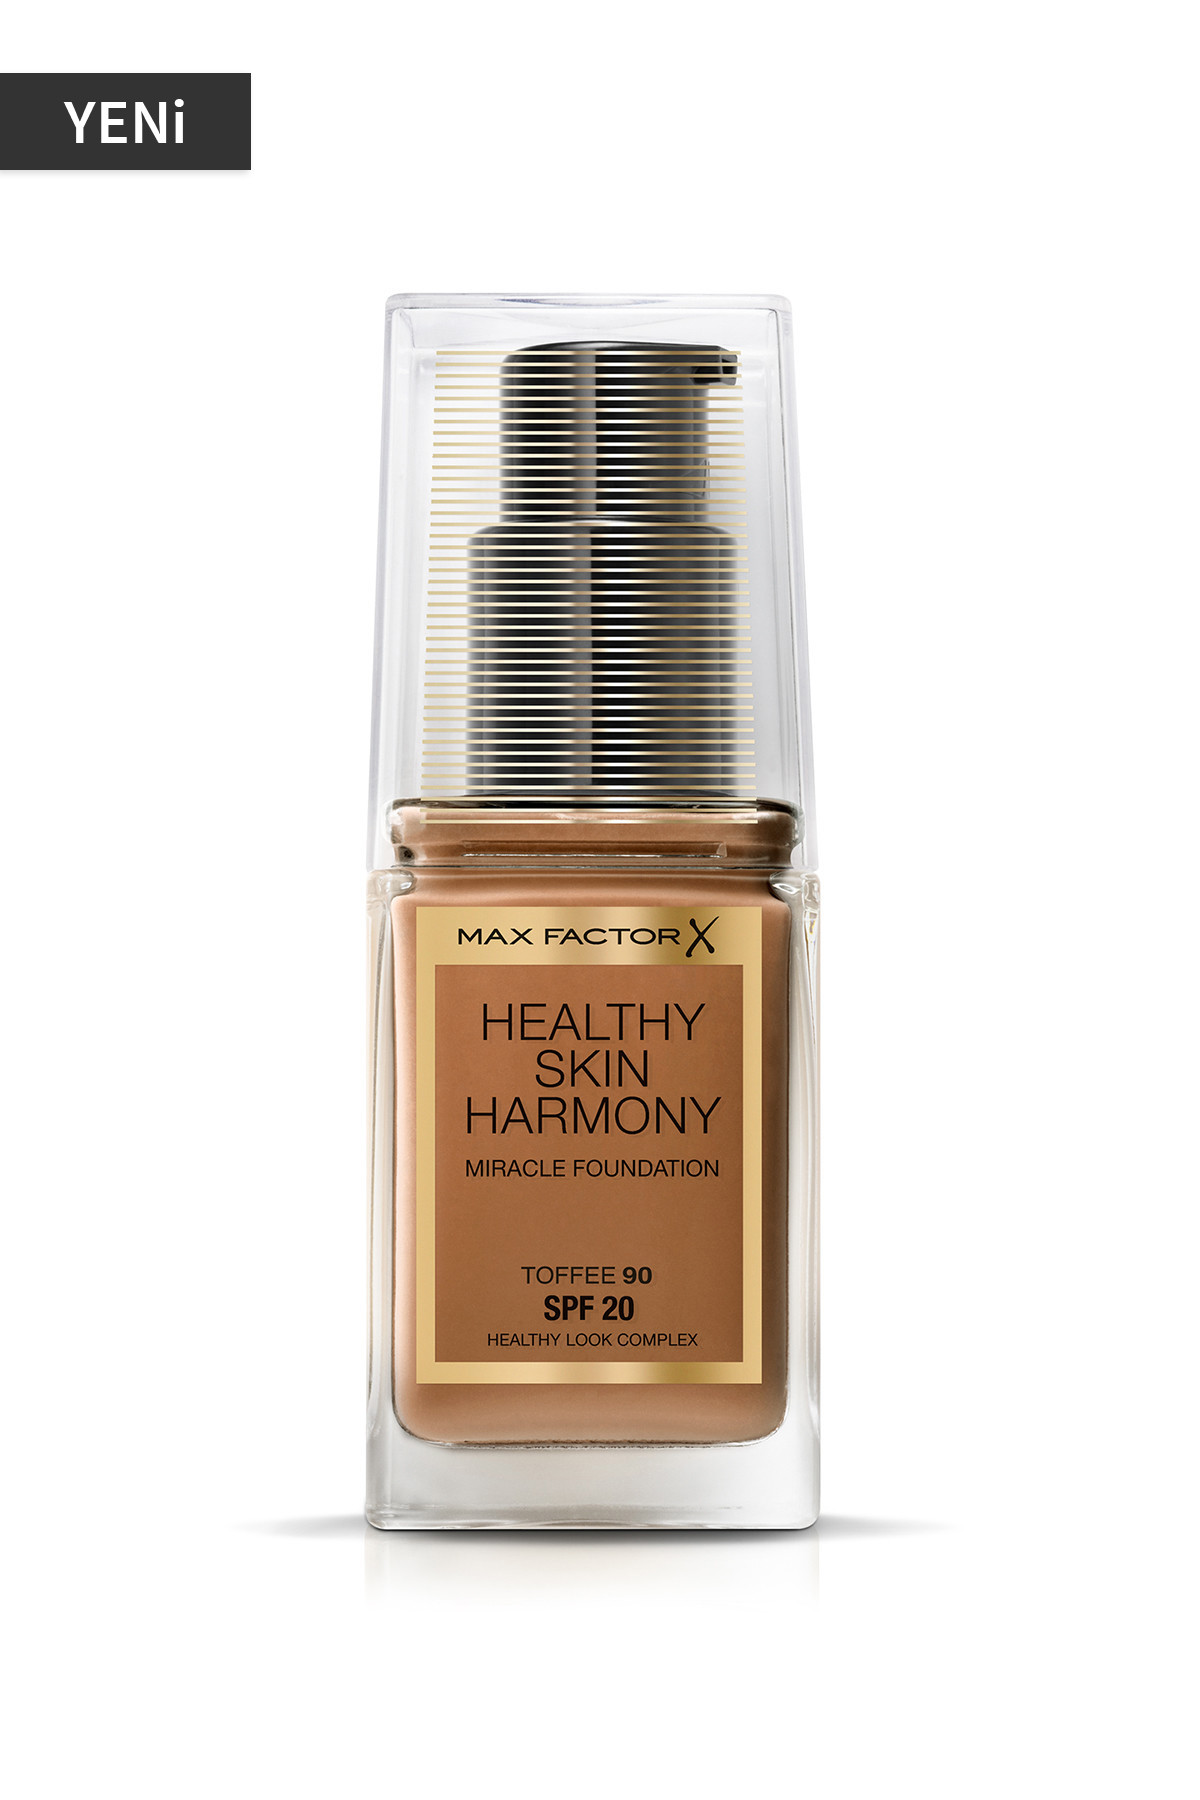 Fondöten - Healthy Skin Harmony Miracle Foundation 90Toffee 8005610433646